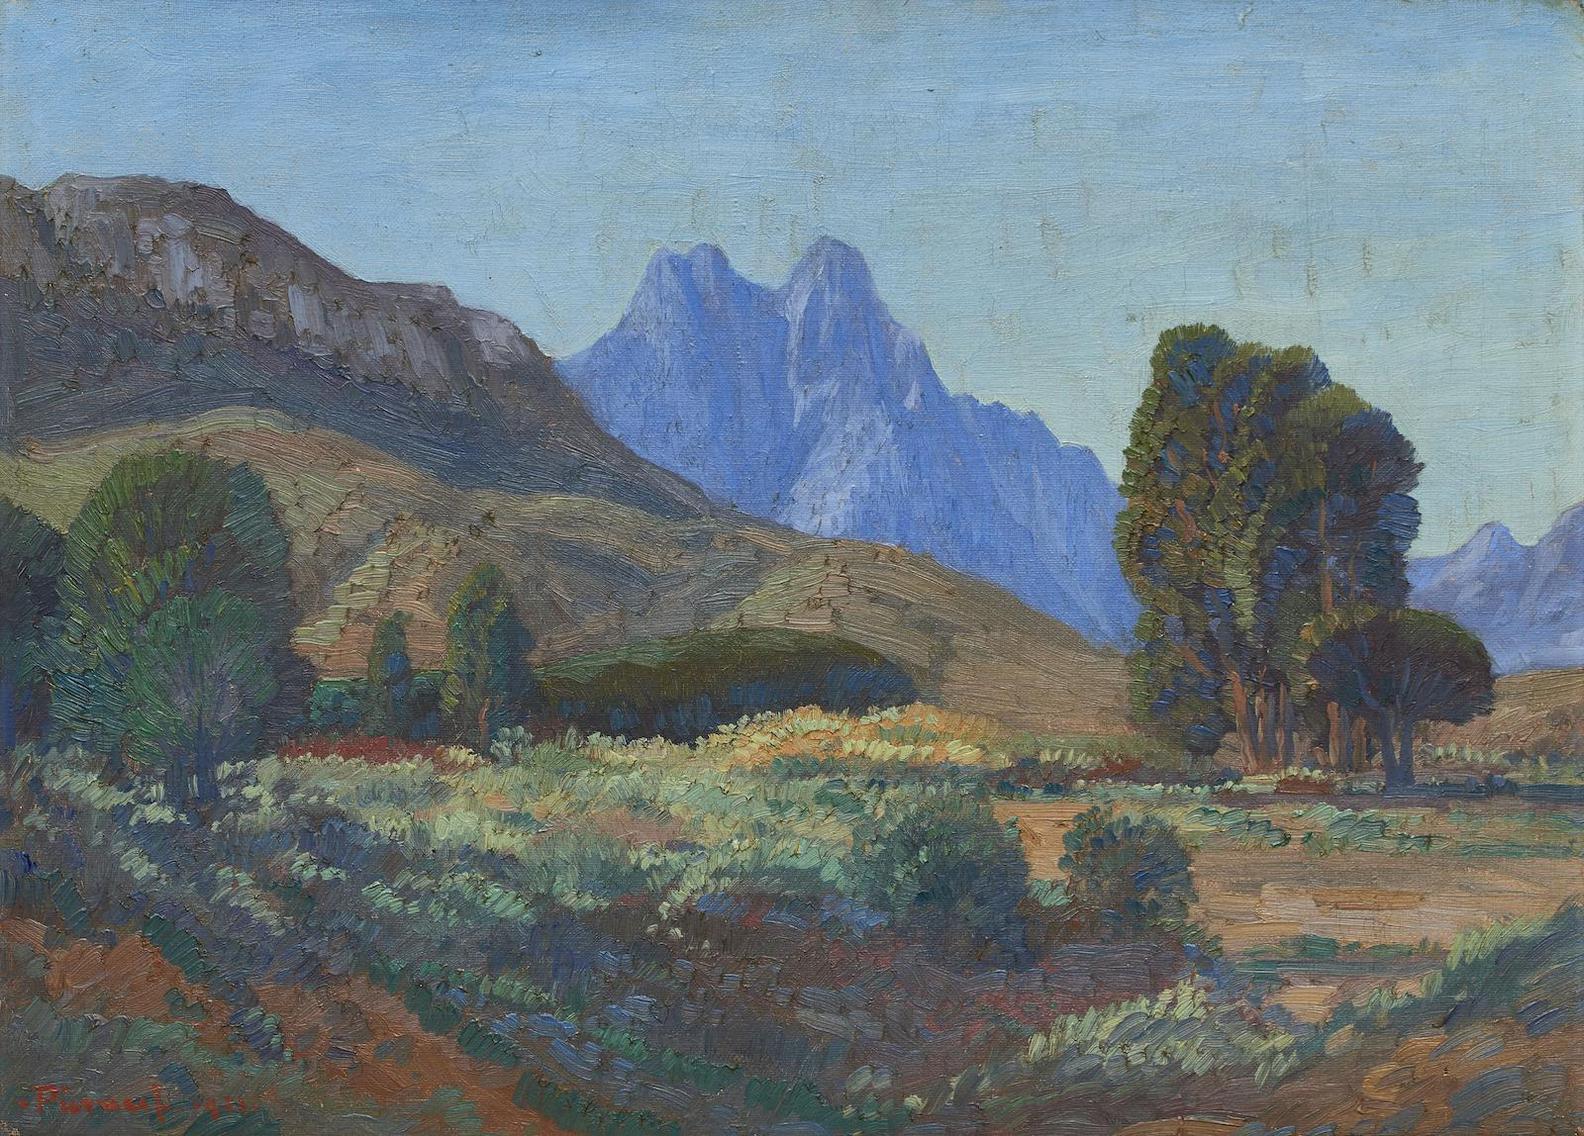 Jacob Hendrik Pierneef - Jonkershoek, Stellenbosch-1921